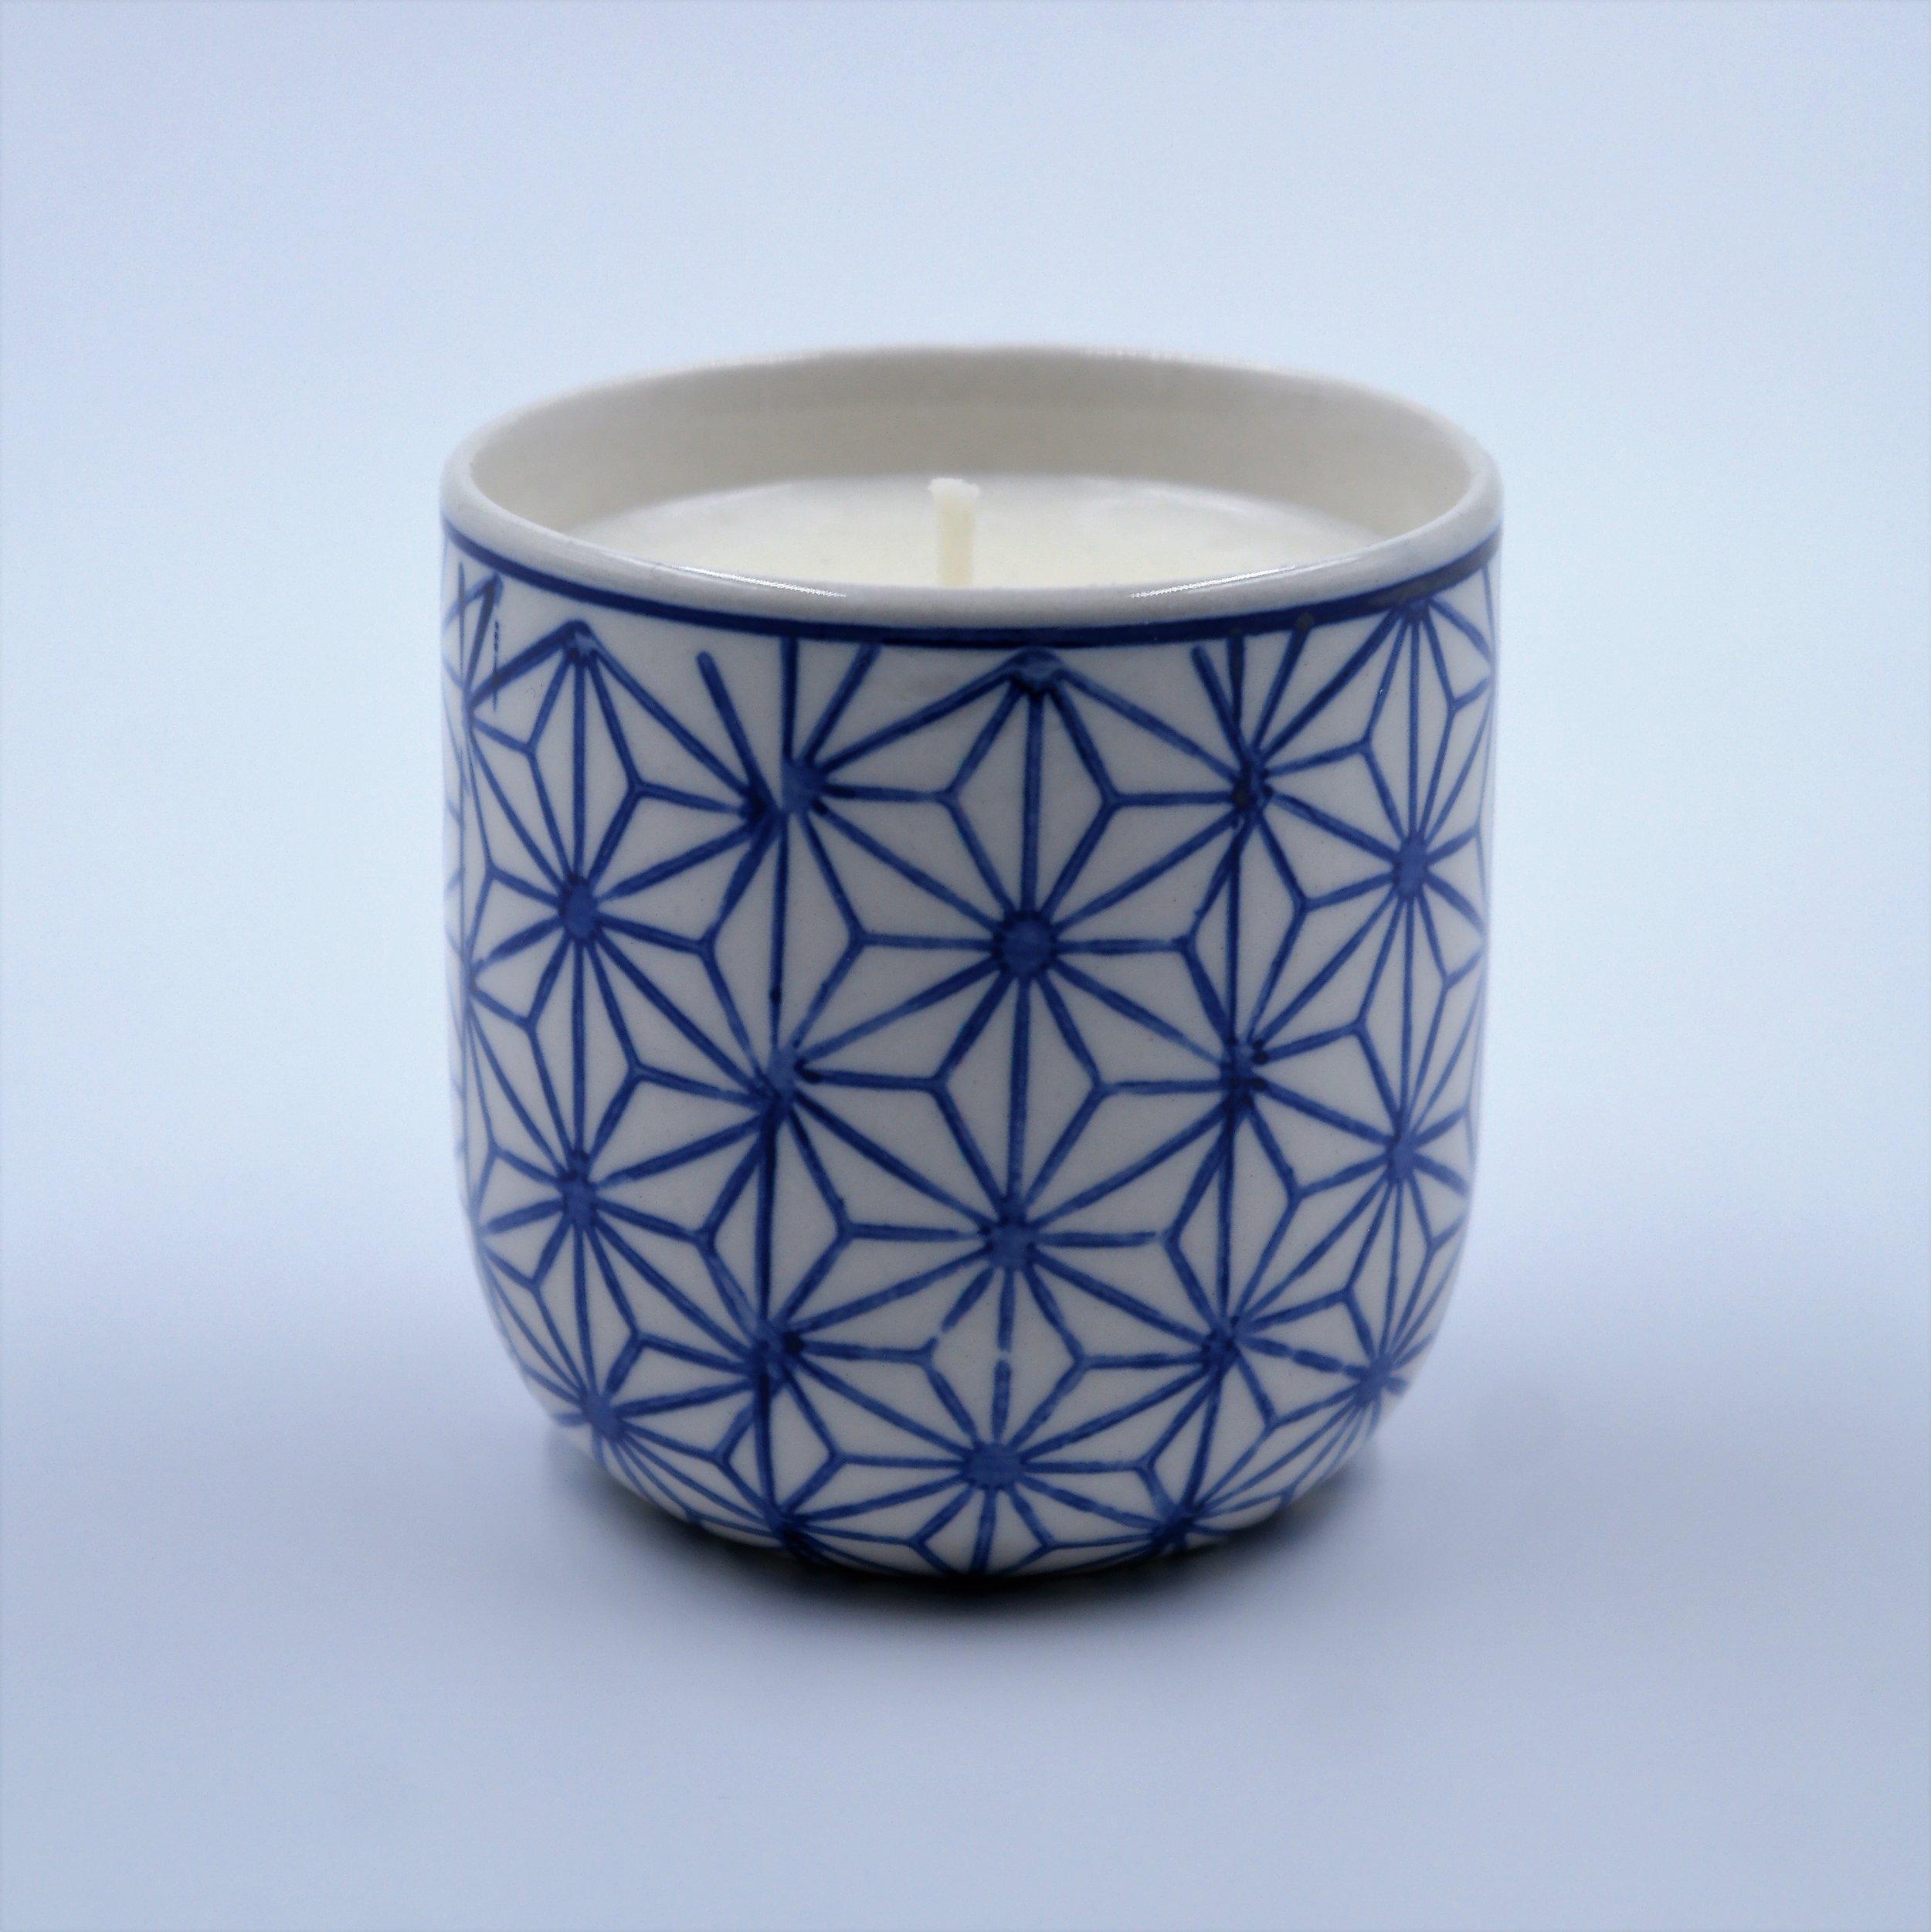 Woodland Soy Wax Candle - $20